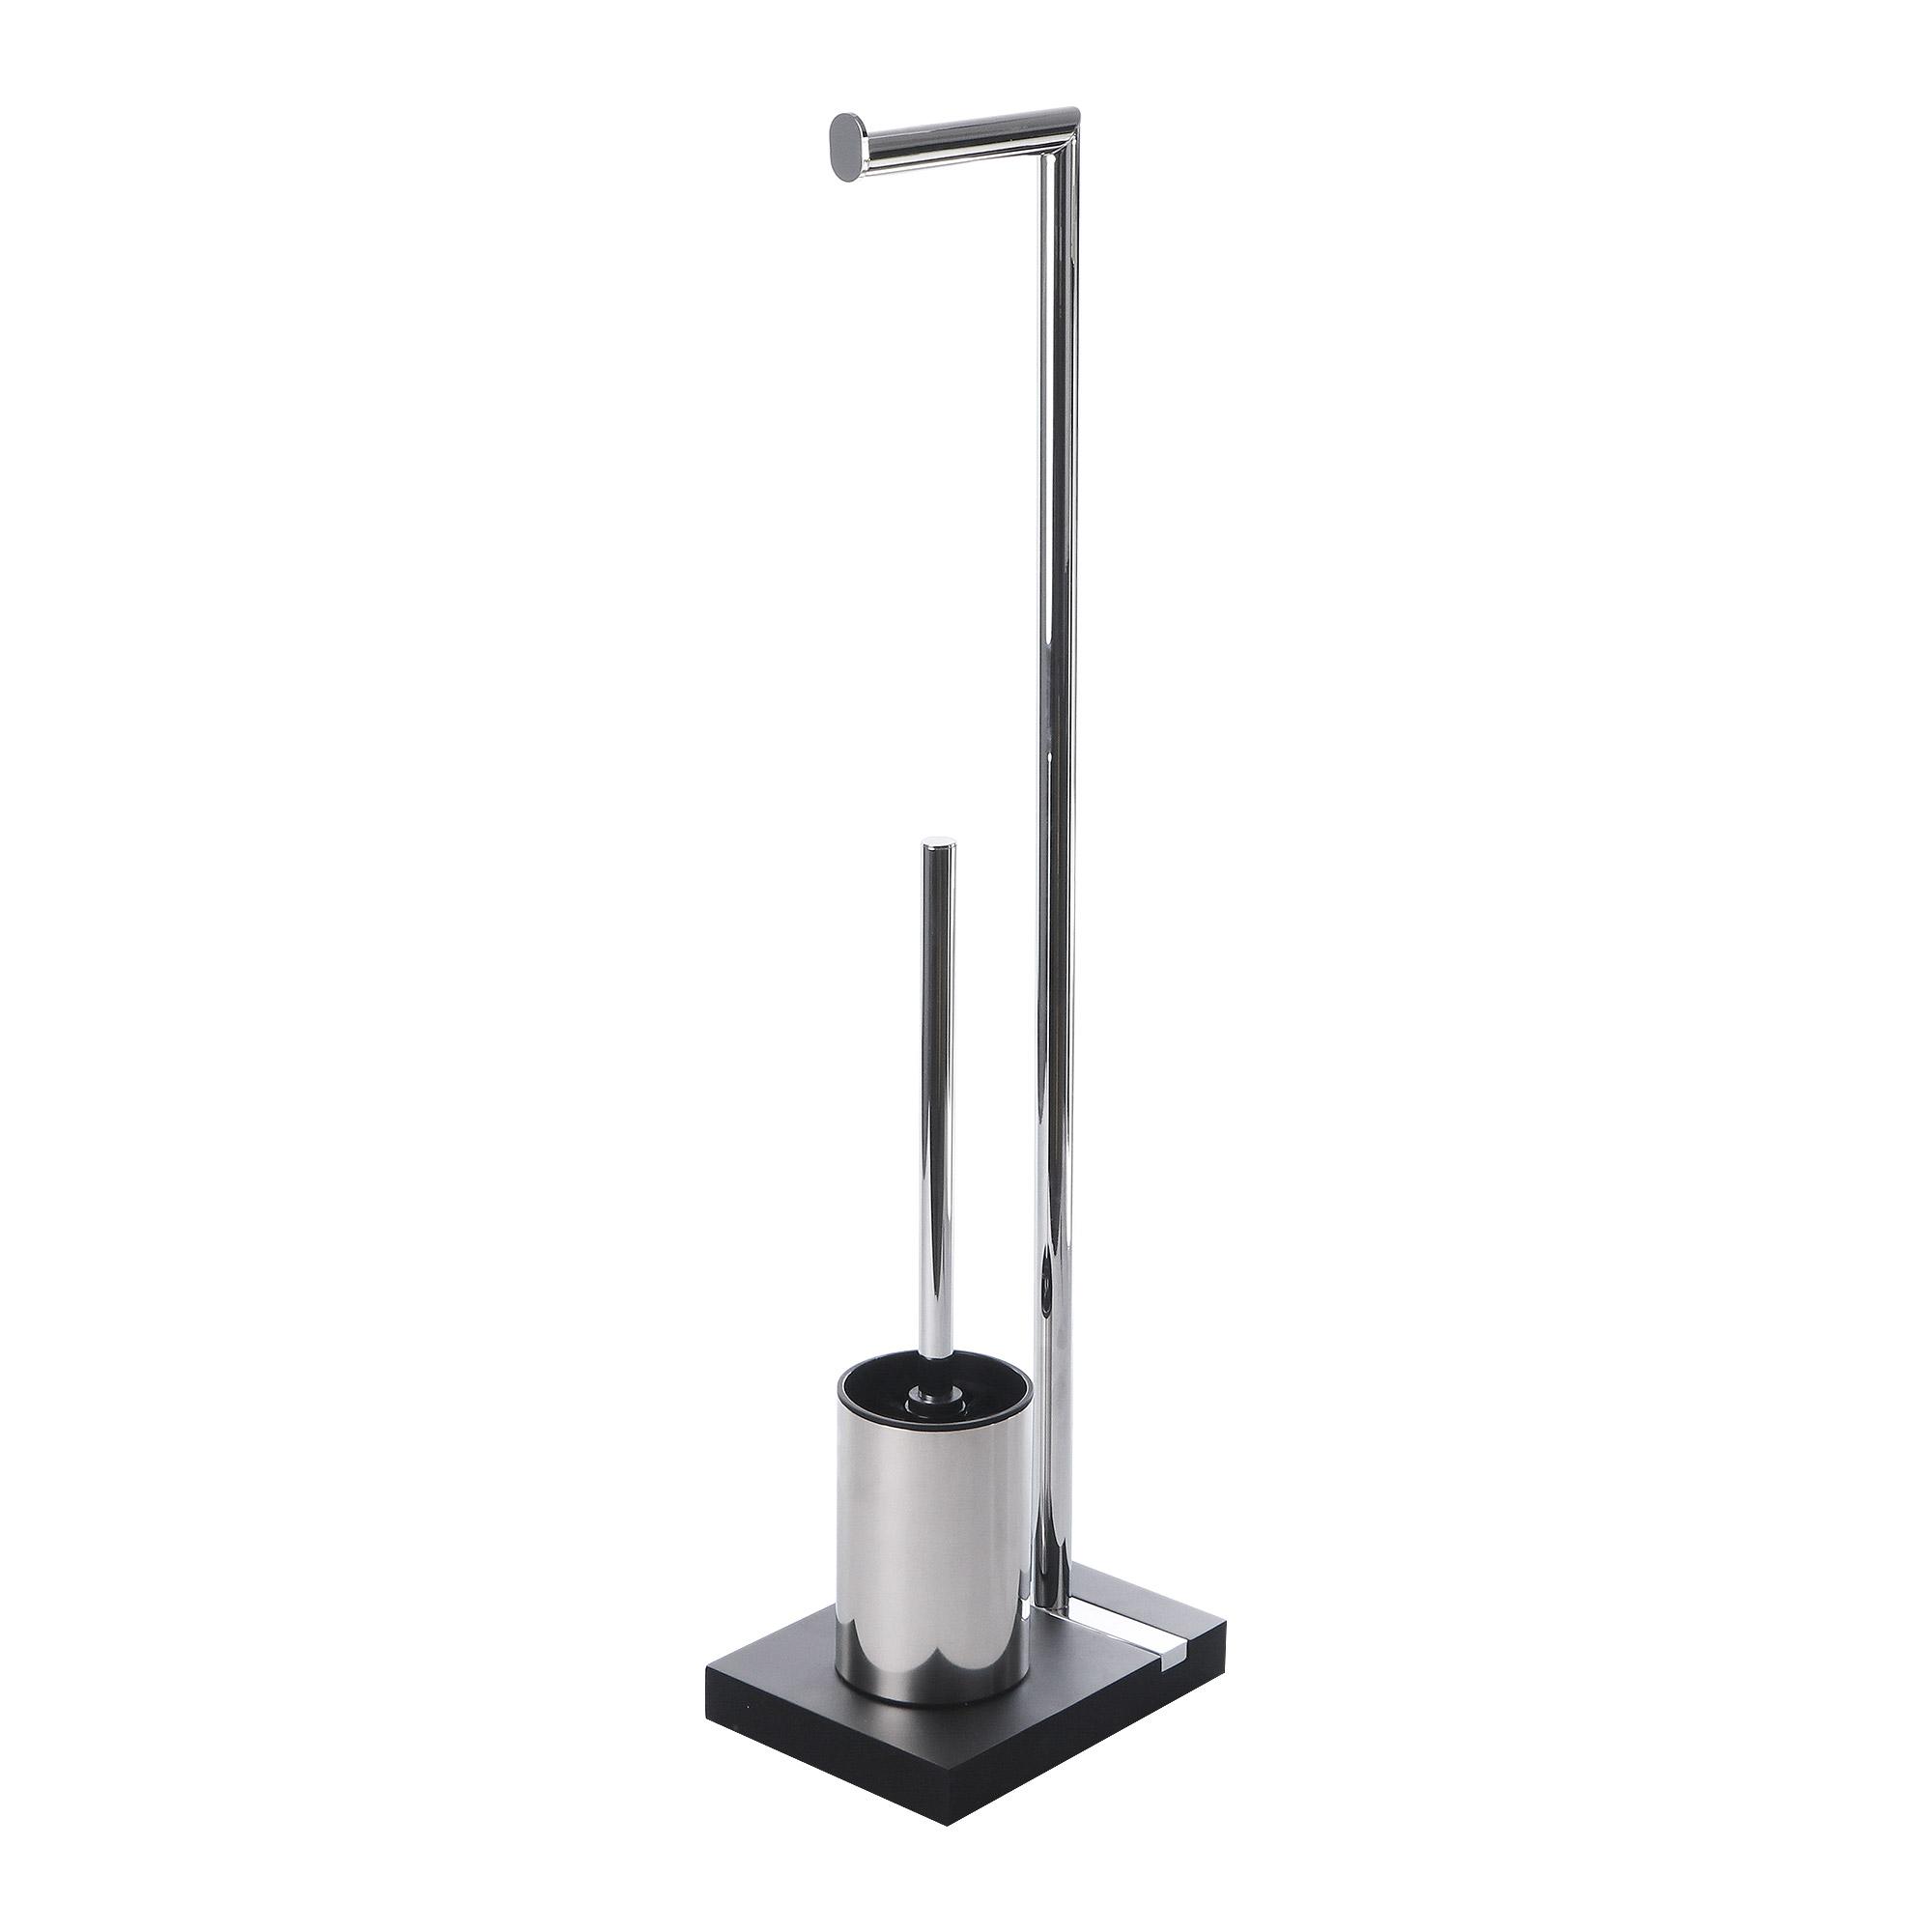 Гарнитур для туалета Wenko sanitary brush noble чёрный гарнитур для туалета wenko sanitary brush samona